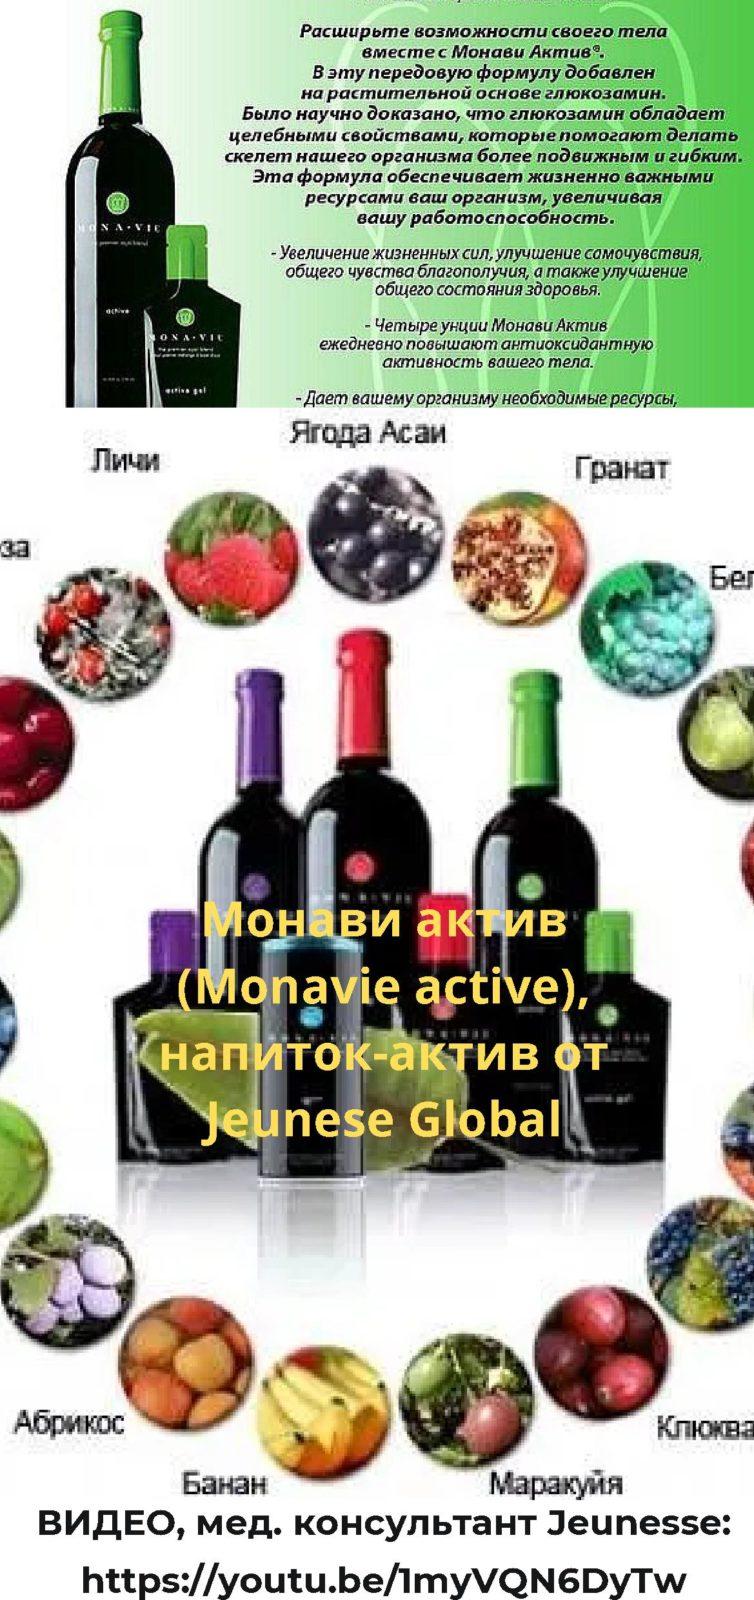 Расширьте свои возможности, вместе с Монави актив (Monavie active), напиток-актив от Jeunese Global, видео от мед. консультанта. Picture